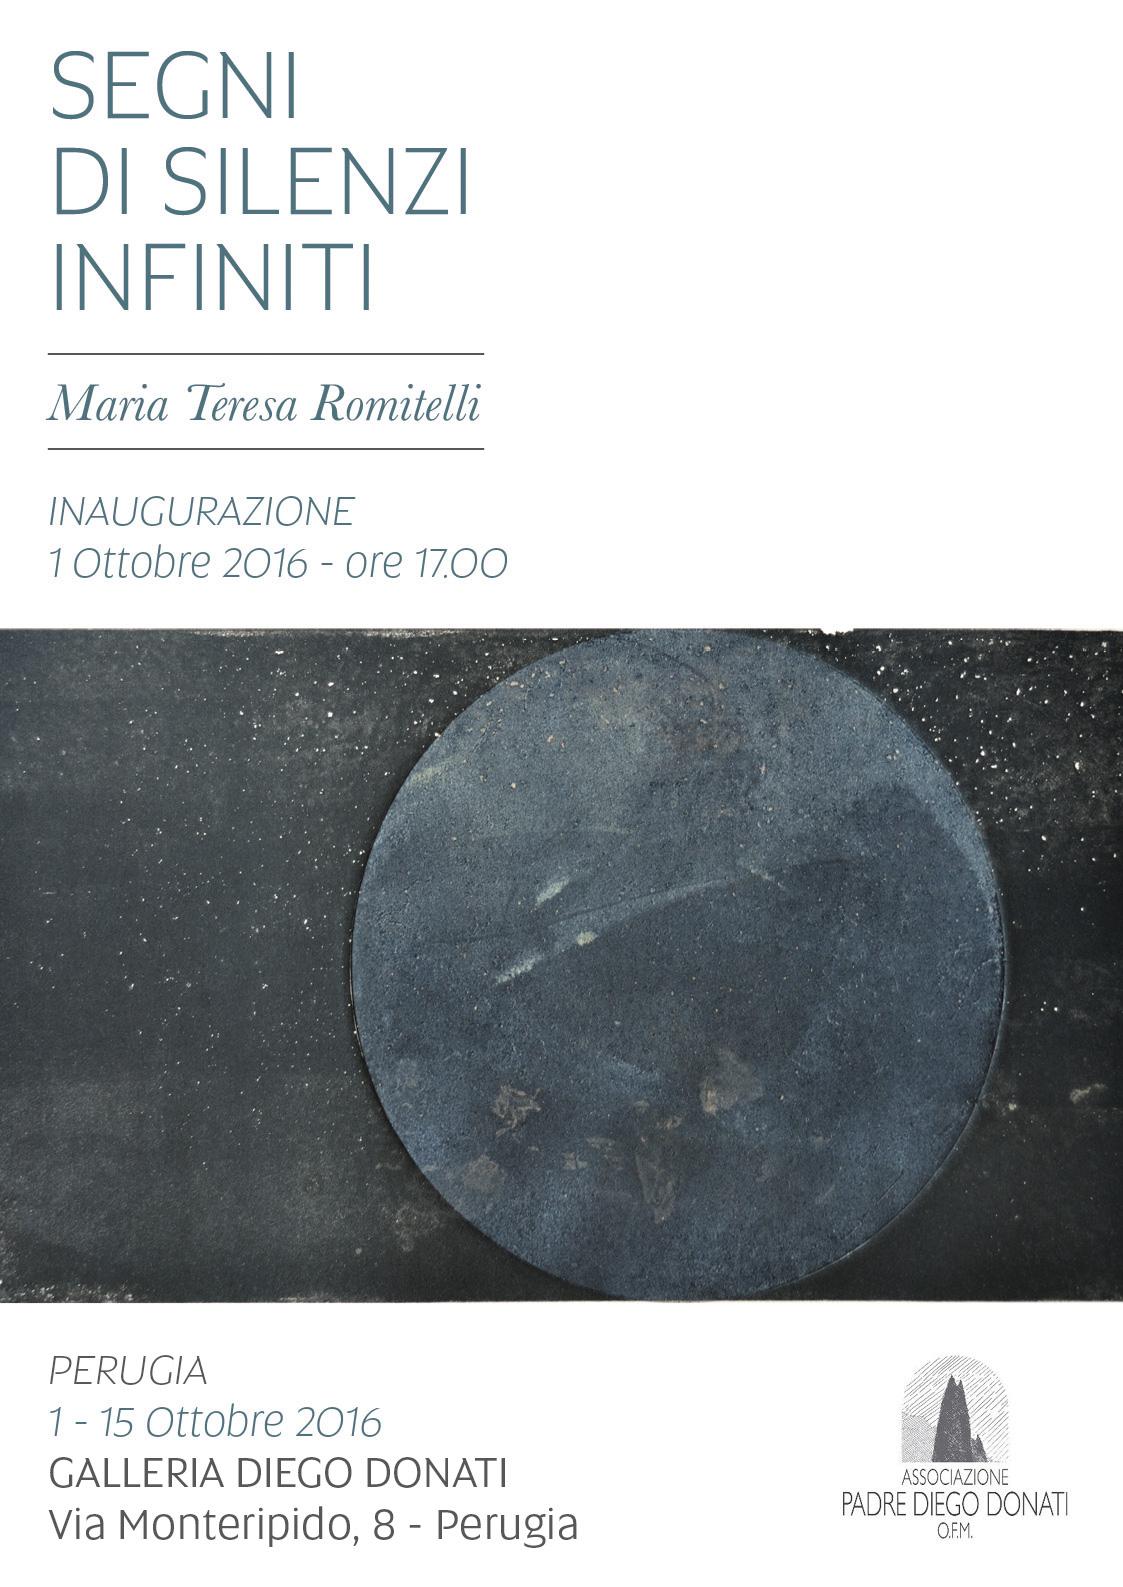 fbac20ea7d9 Maria Teresa Romitelli – Segni di silenzi infiniti